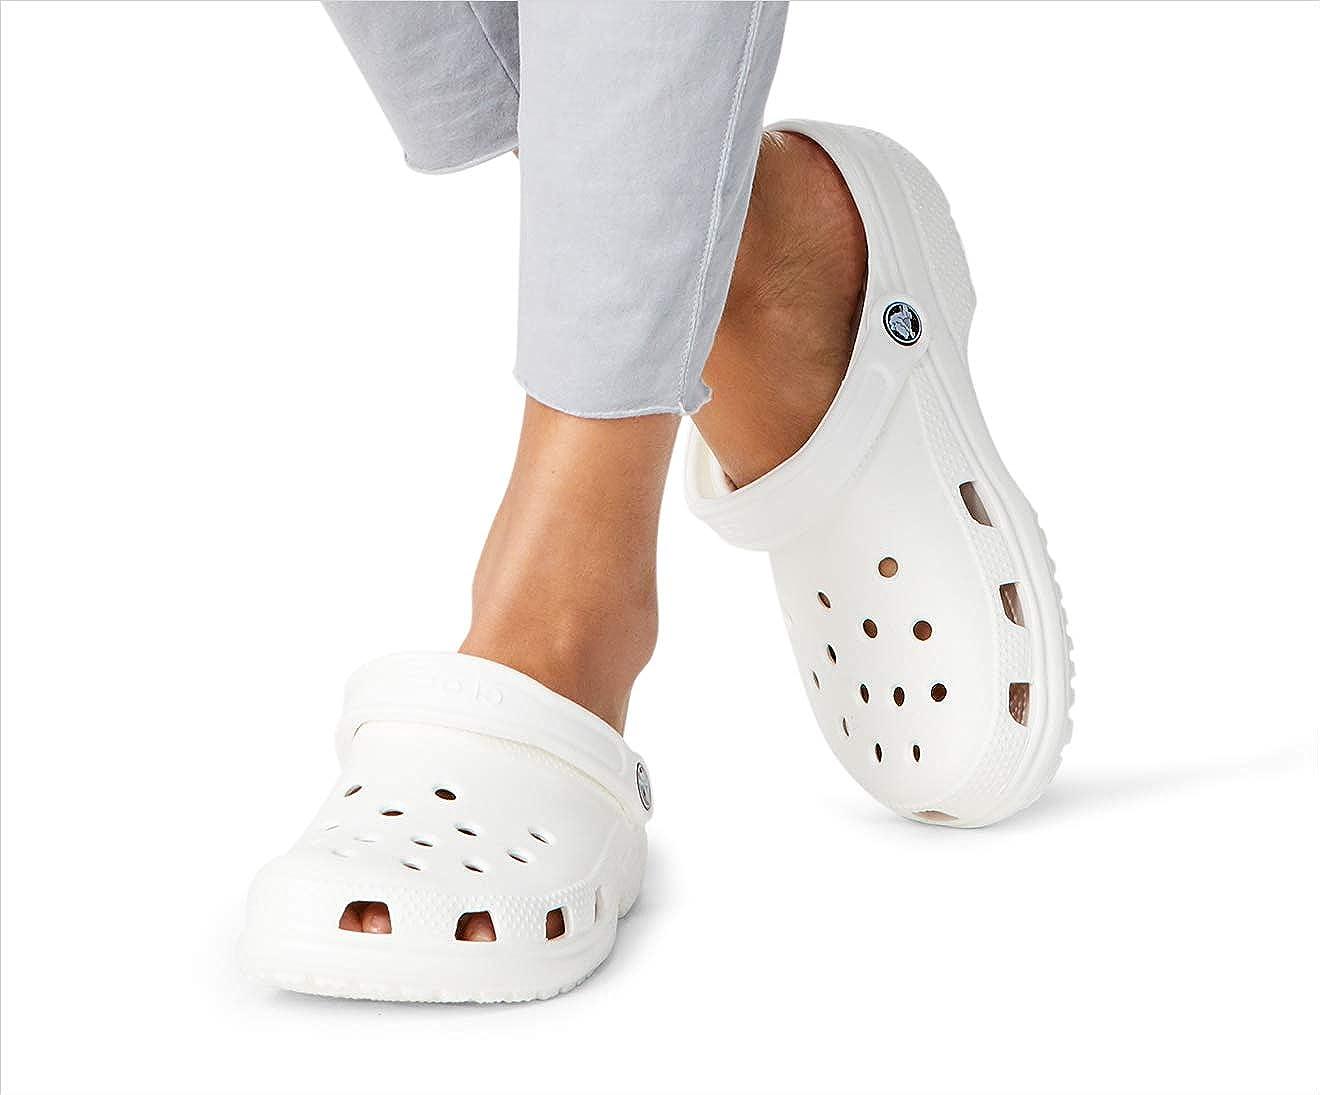 11 M US Women Crocs Classic Clog|Comfortable Slip On Casual Water Shoe Lavender 9 M US Men